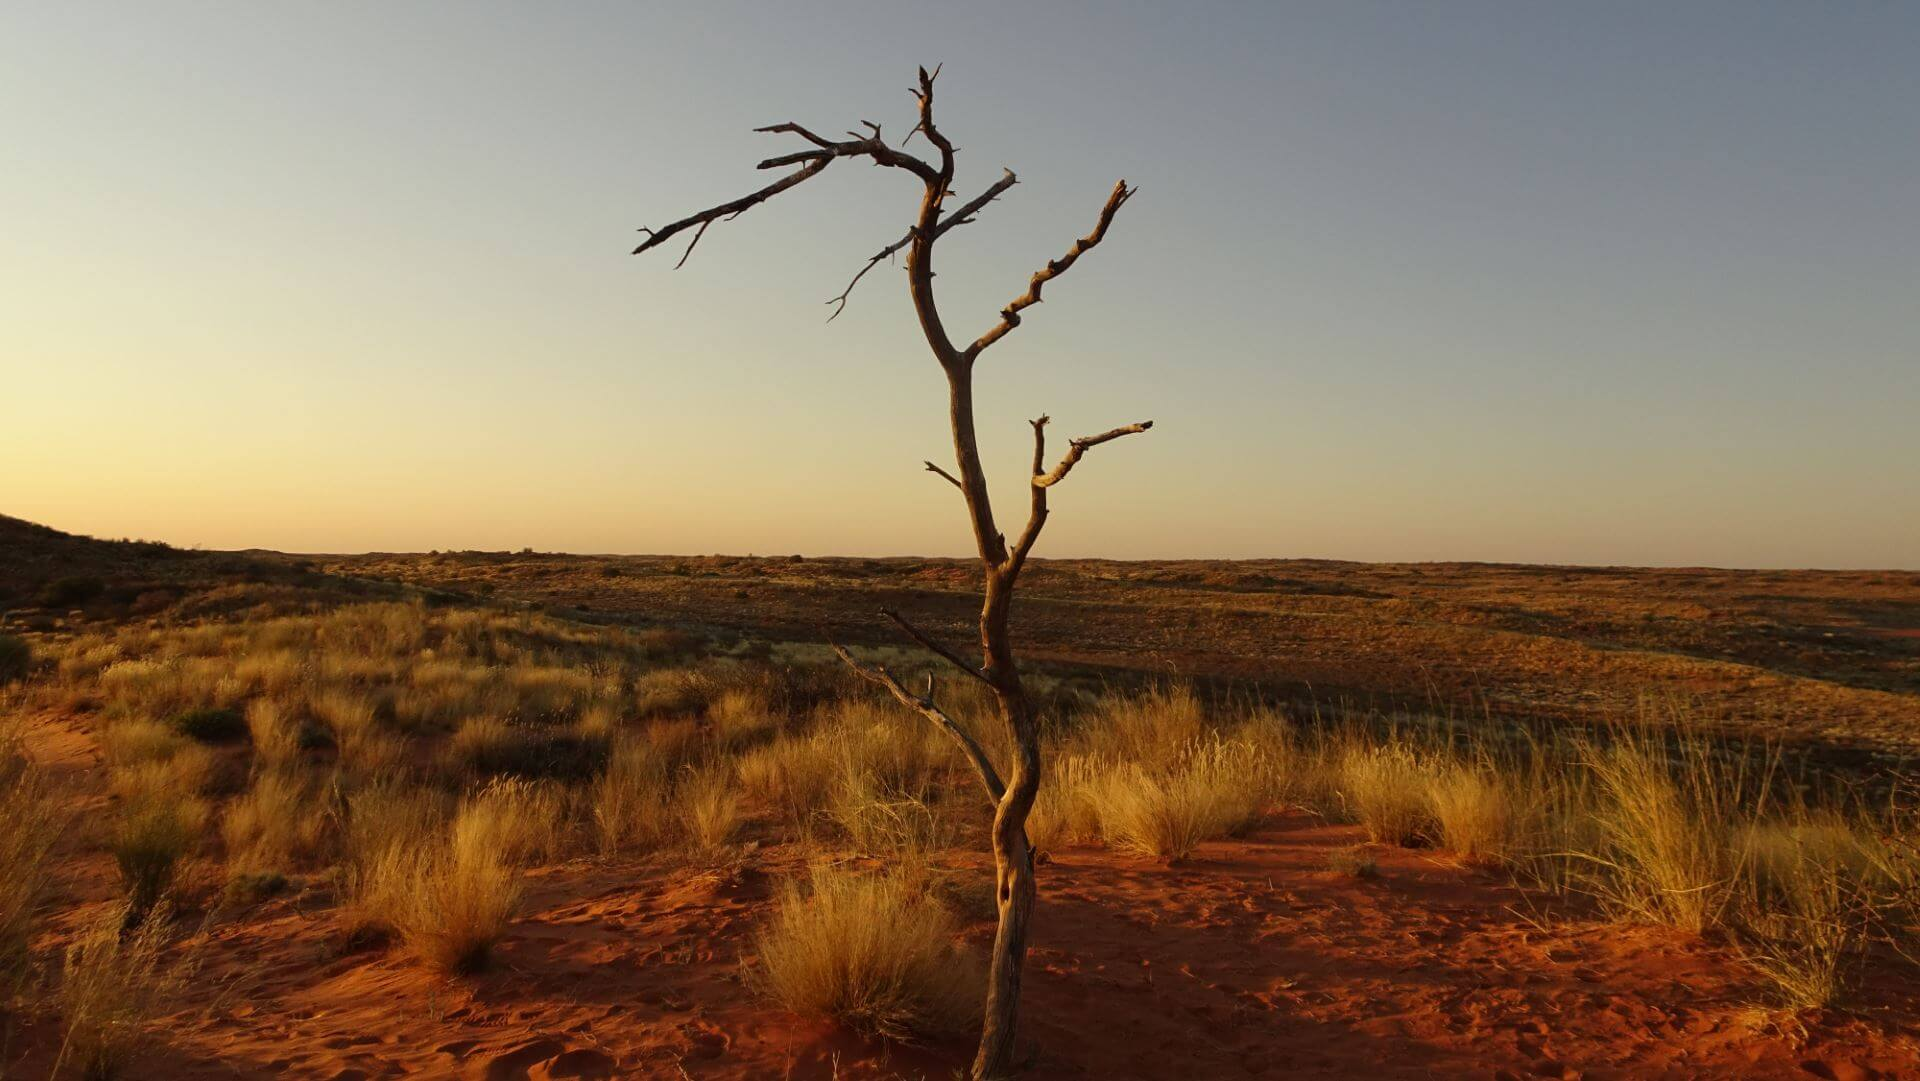 Mietwagen Rundreise Südafrika | Kalahari und Kap genießen